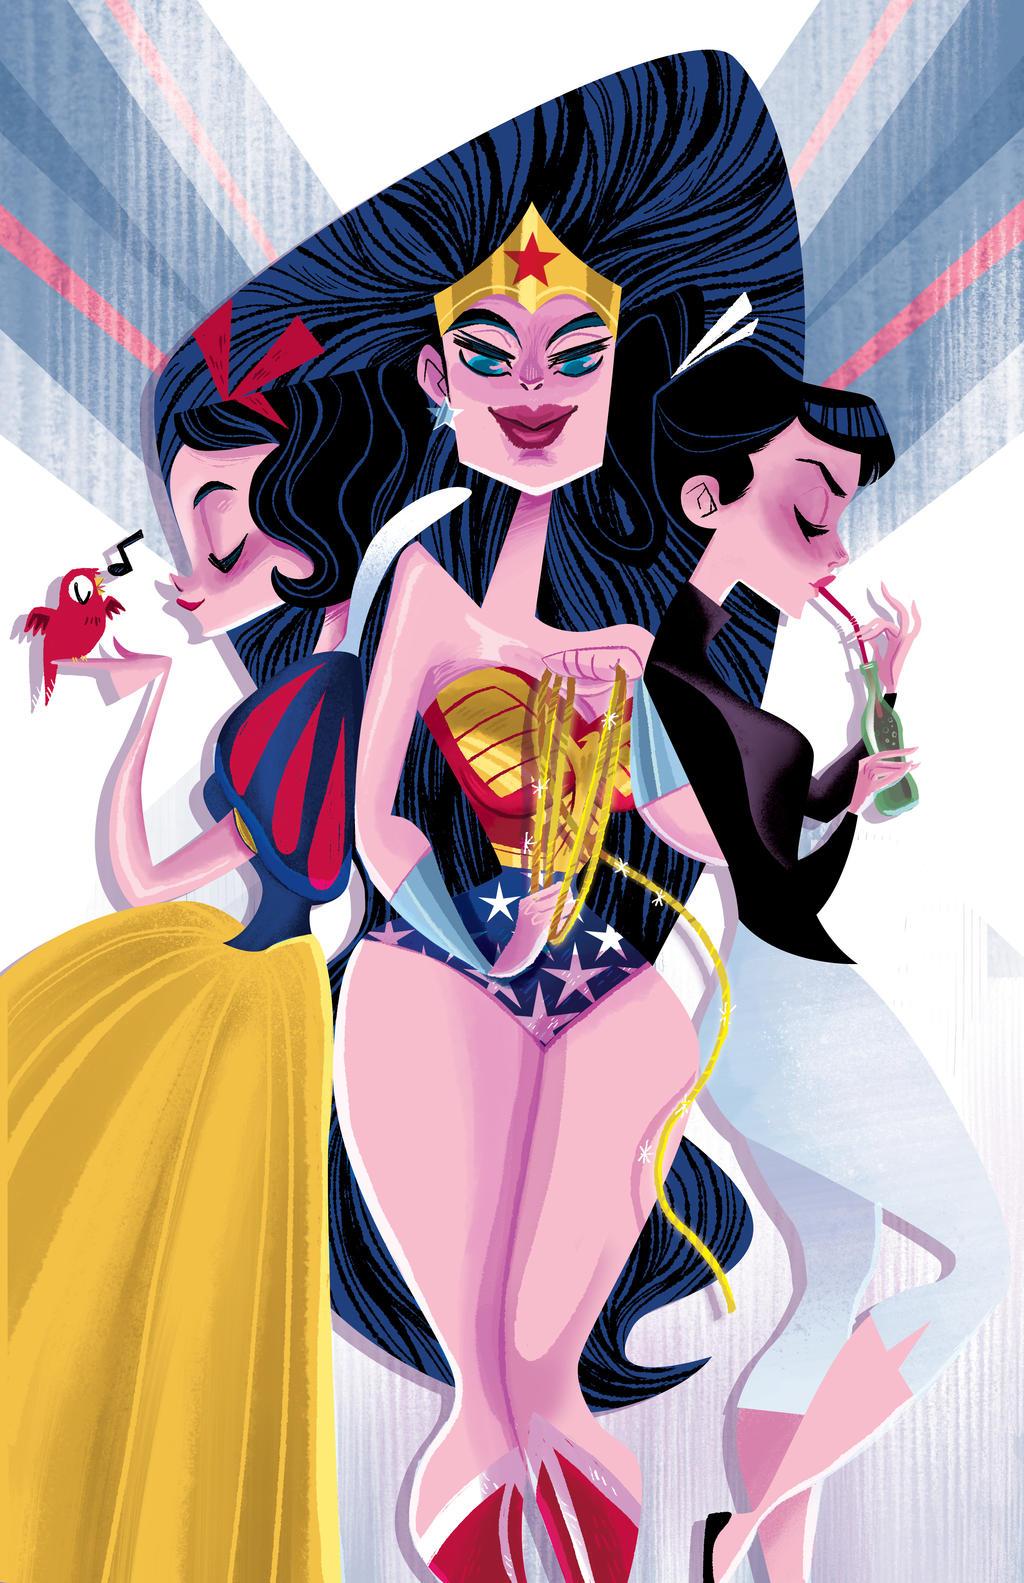 Wonder Woman, Audrey, and Snow by spicysteweddemon